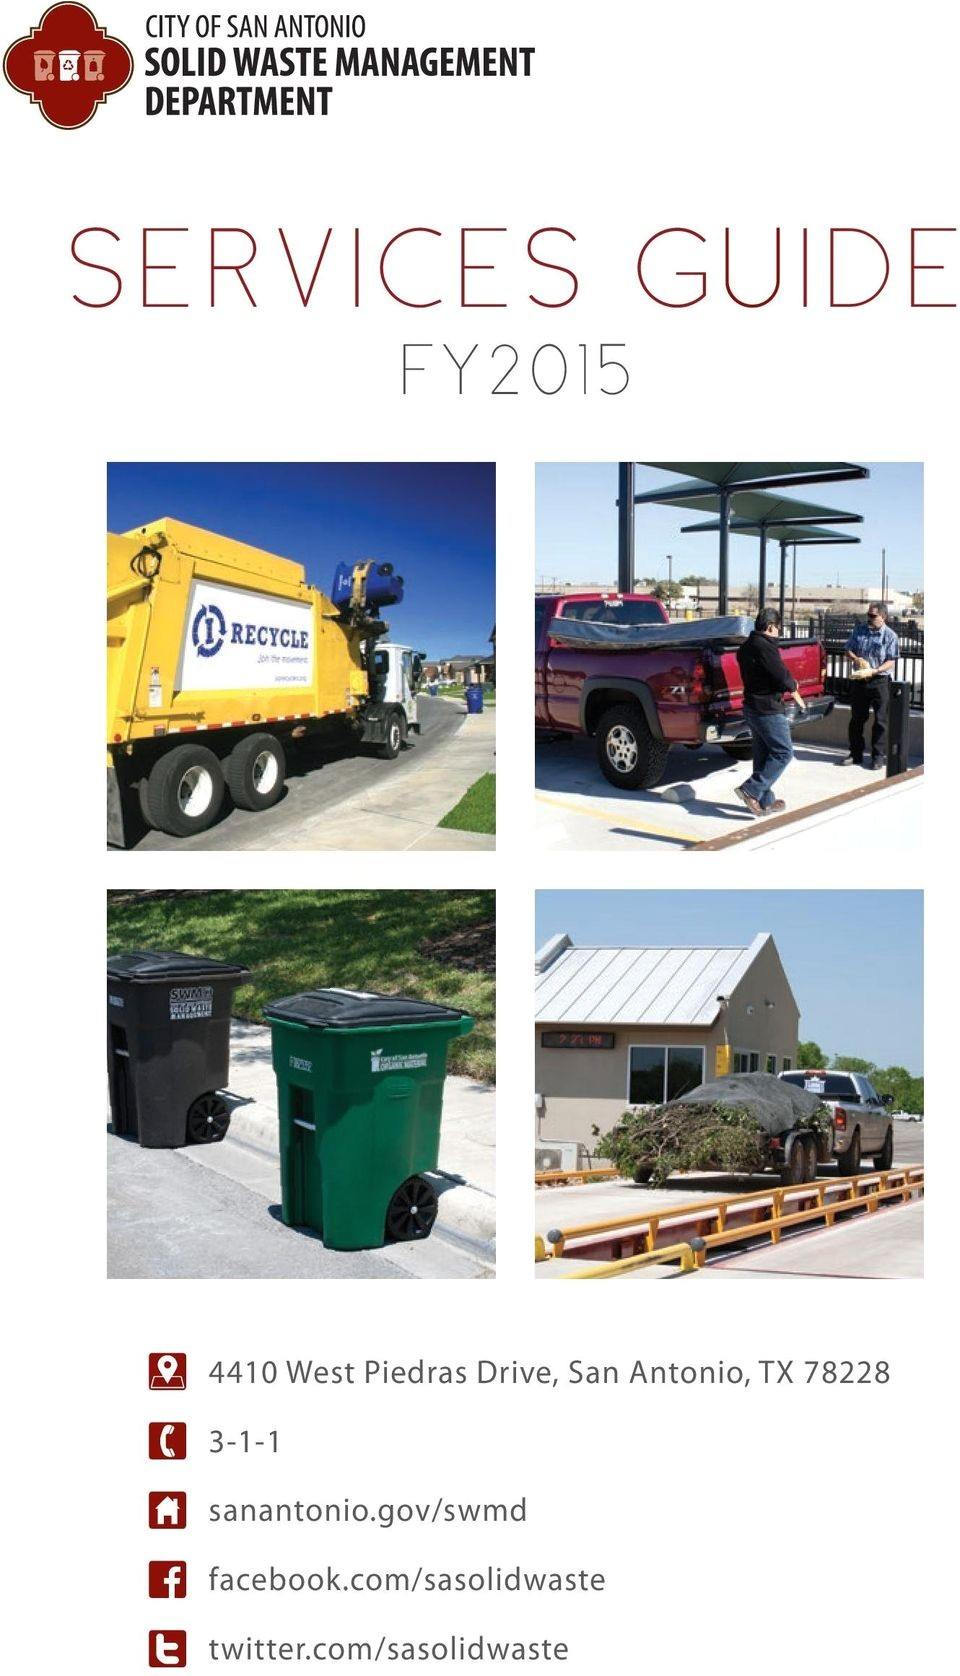 Www Sanantonio Gov Swmd Services Guide Fy2015 F 1 5 F T West Piedras Drive San